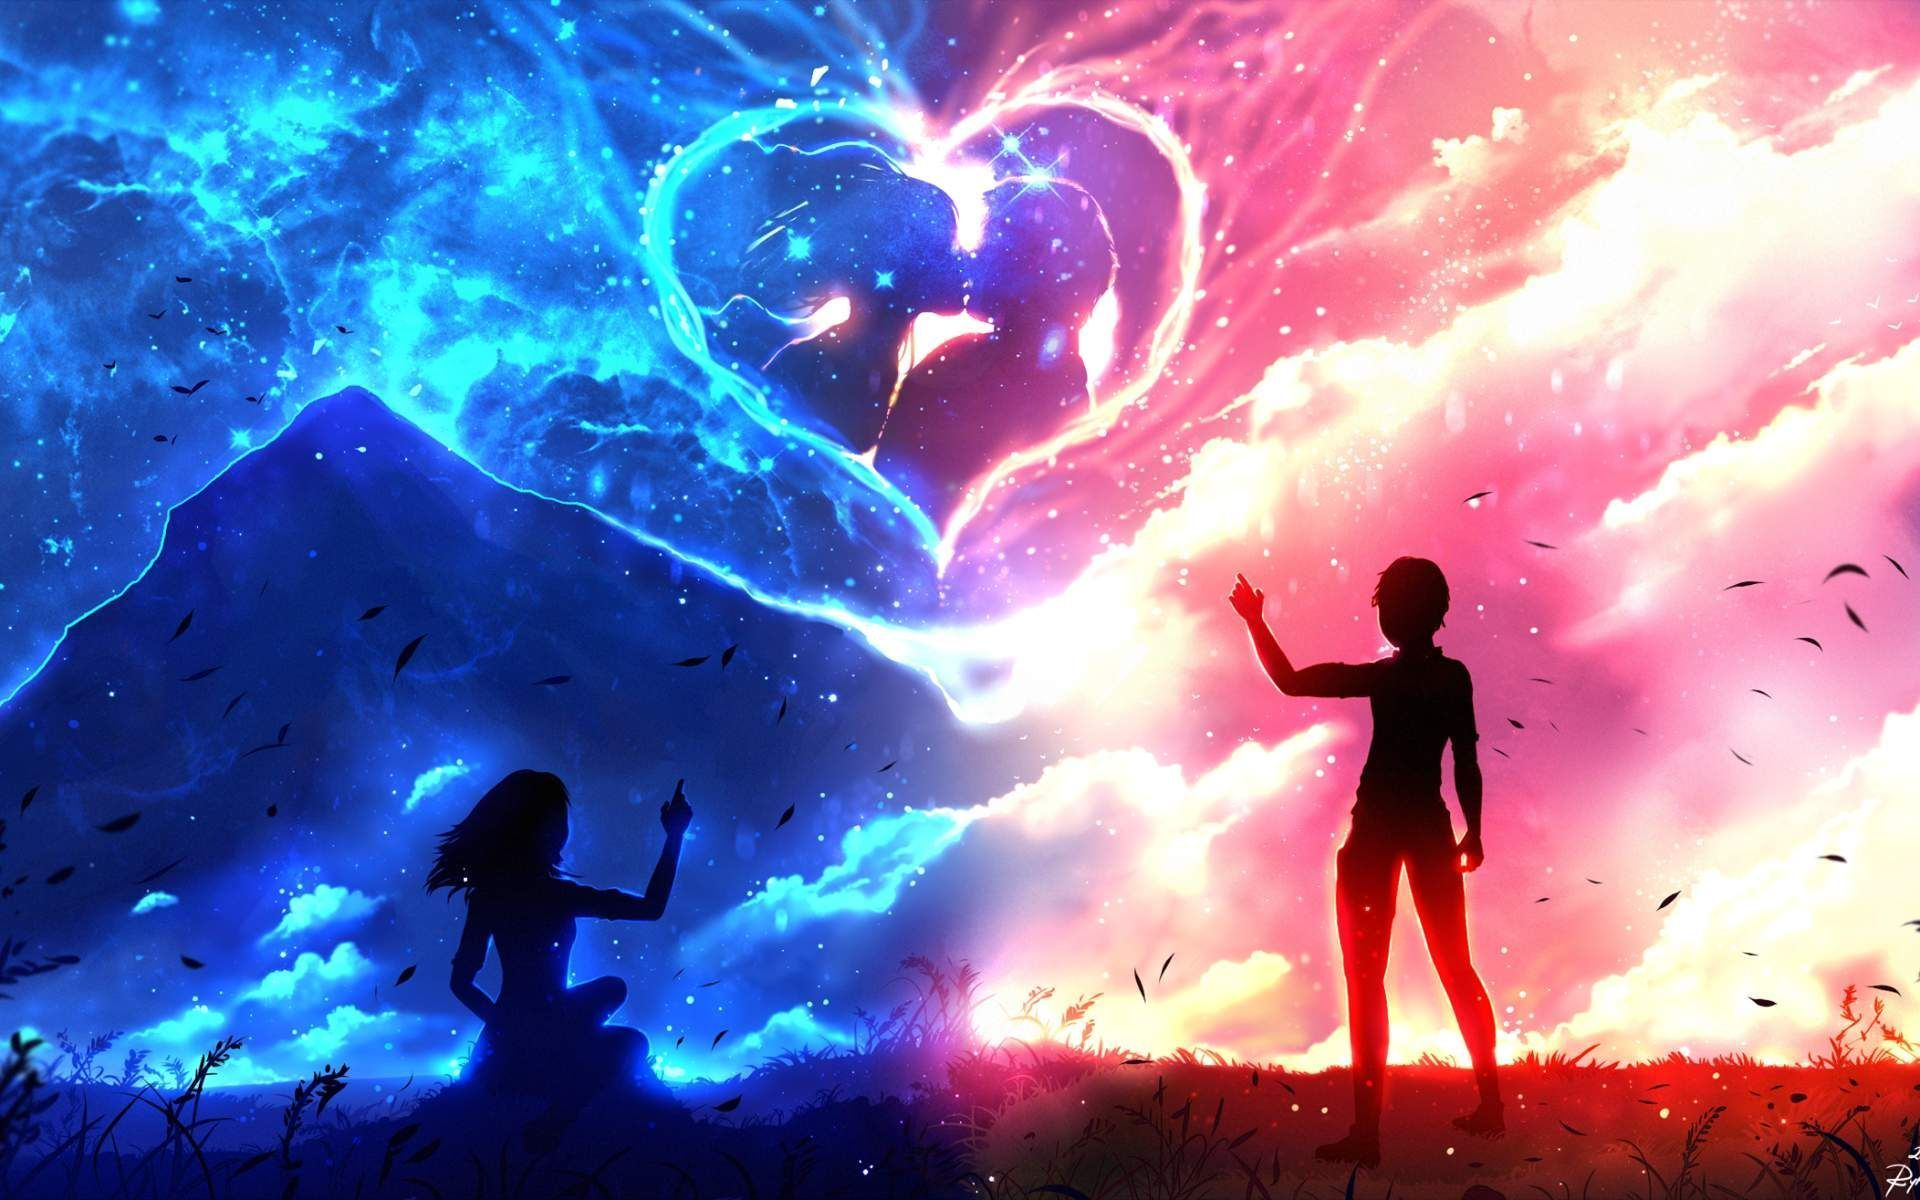 Love Anime Wallpapers Top Free Love Anime Backgrounds Wallpaperaccess Latar Belakang Anime Cinta Anime Wallpaper Pasangan